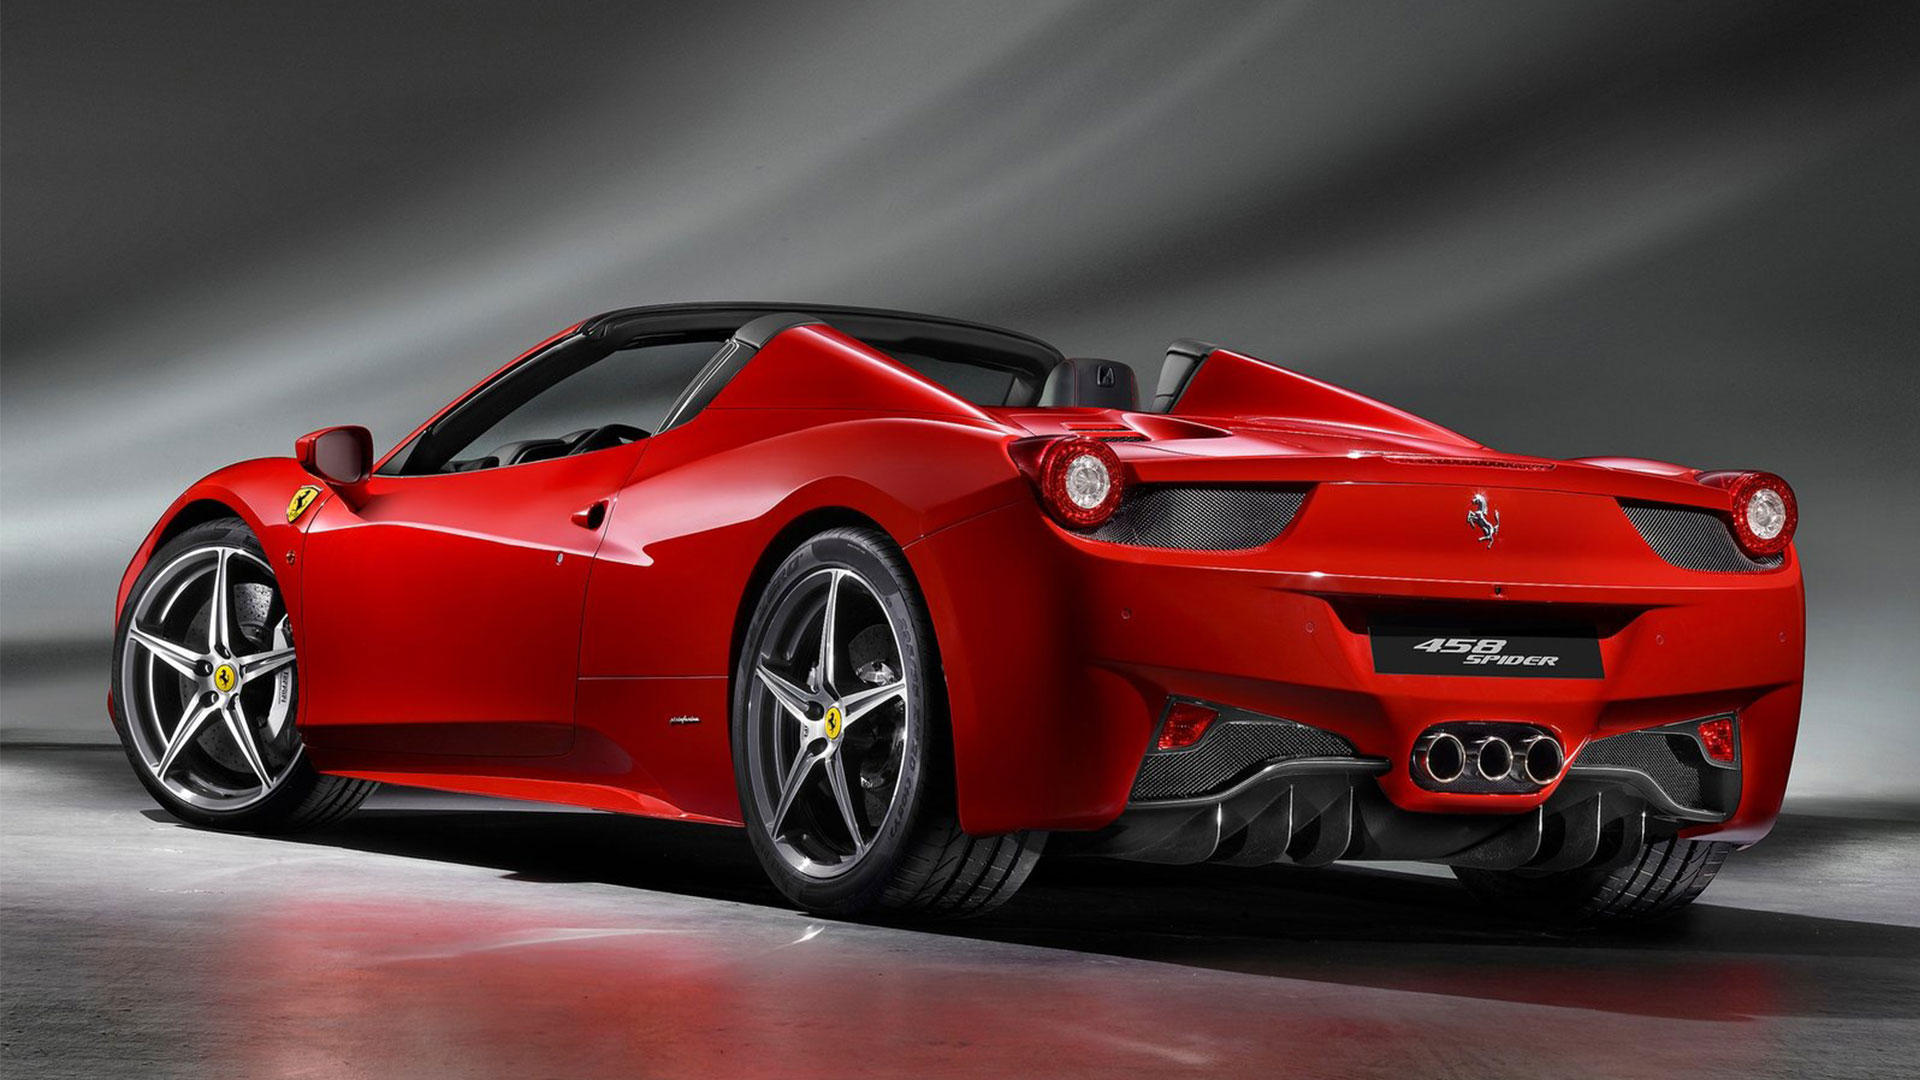 Image - RED-Ferrari-458-Spider-2013.jpg | Happy Tree ...  Ferrari 458 Spider Red